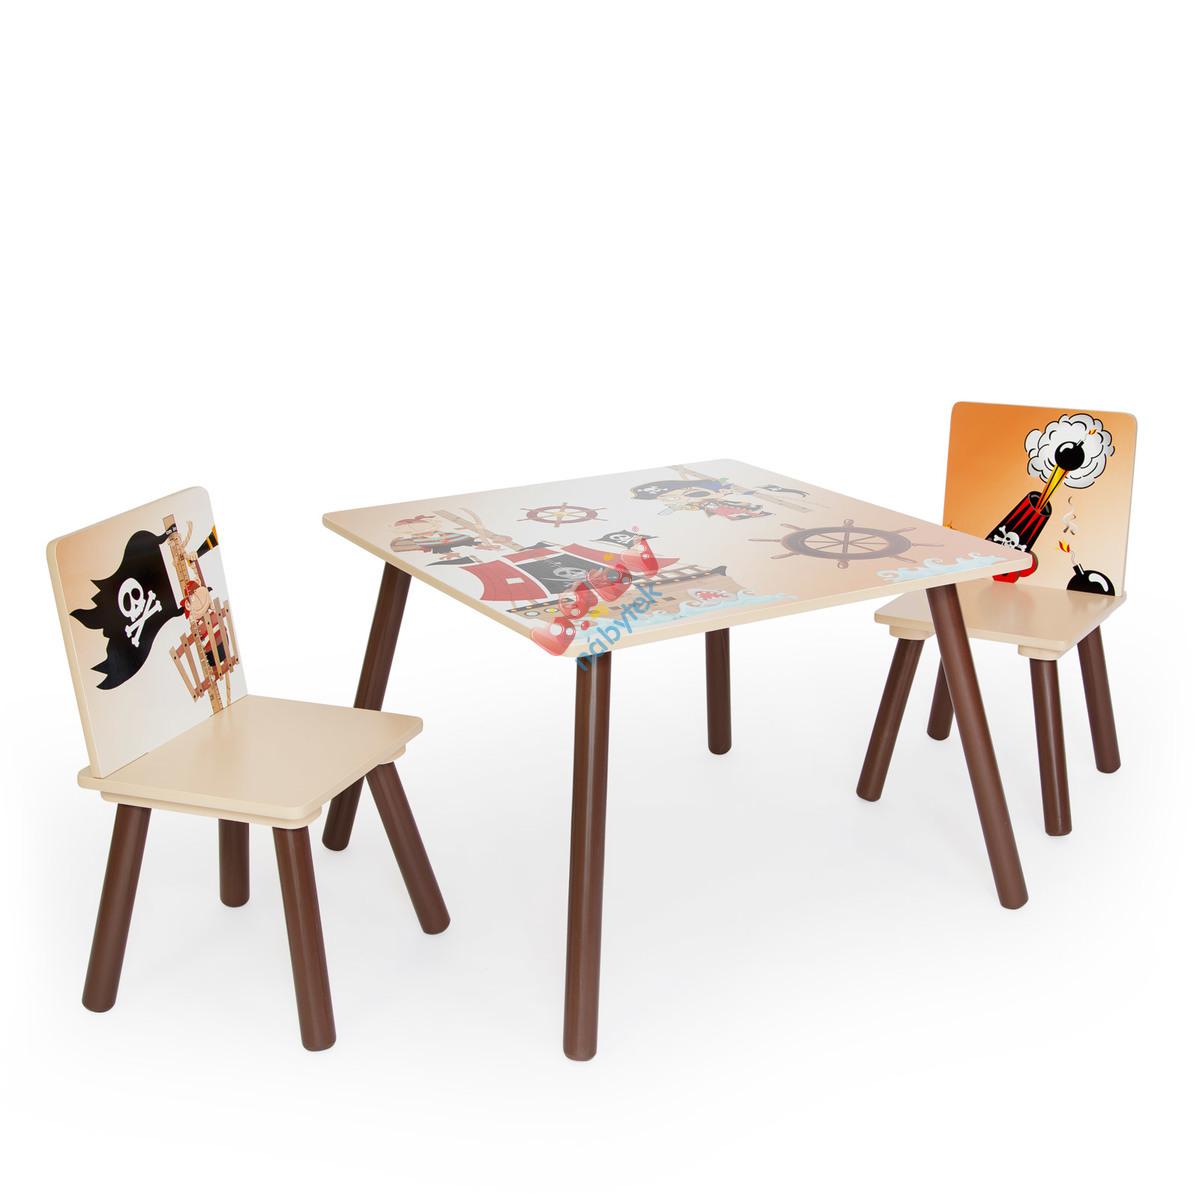 b41c8cc03bf4f Detský stôl so stoličkami - pirát - Stôl a stoličky - babynabytek.sk